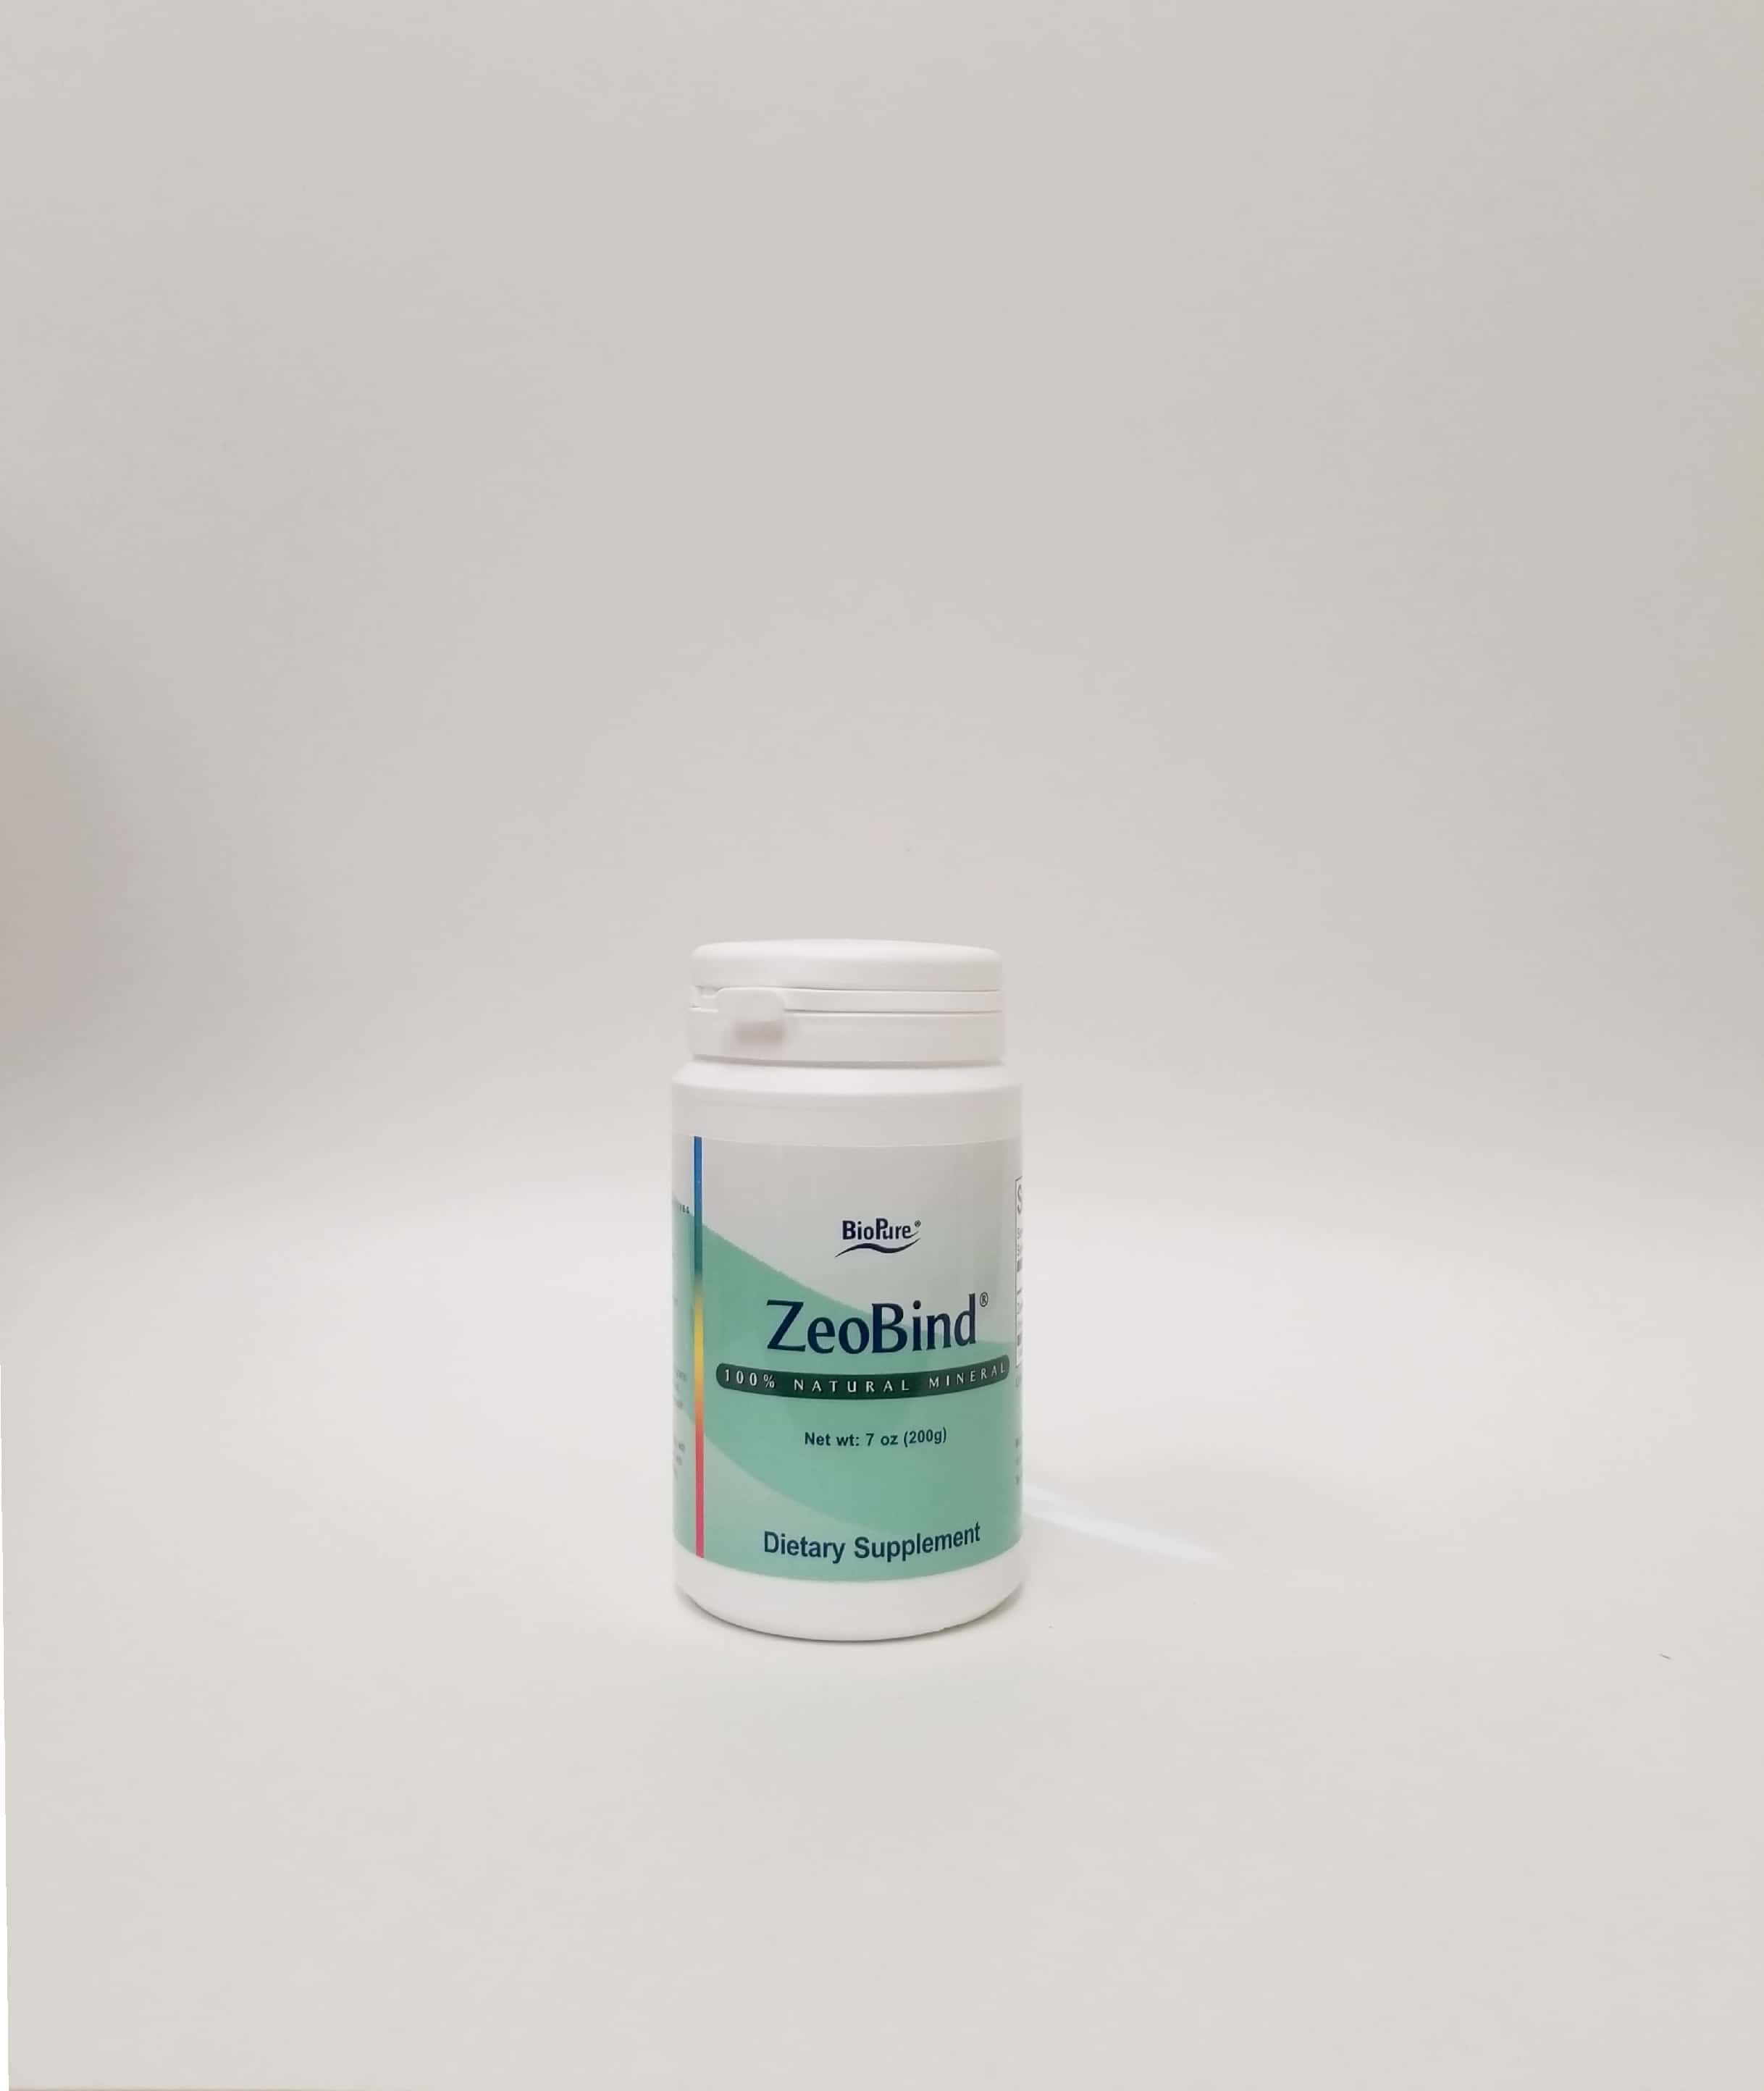 BioPure ZeoBind Powder 200 grams